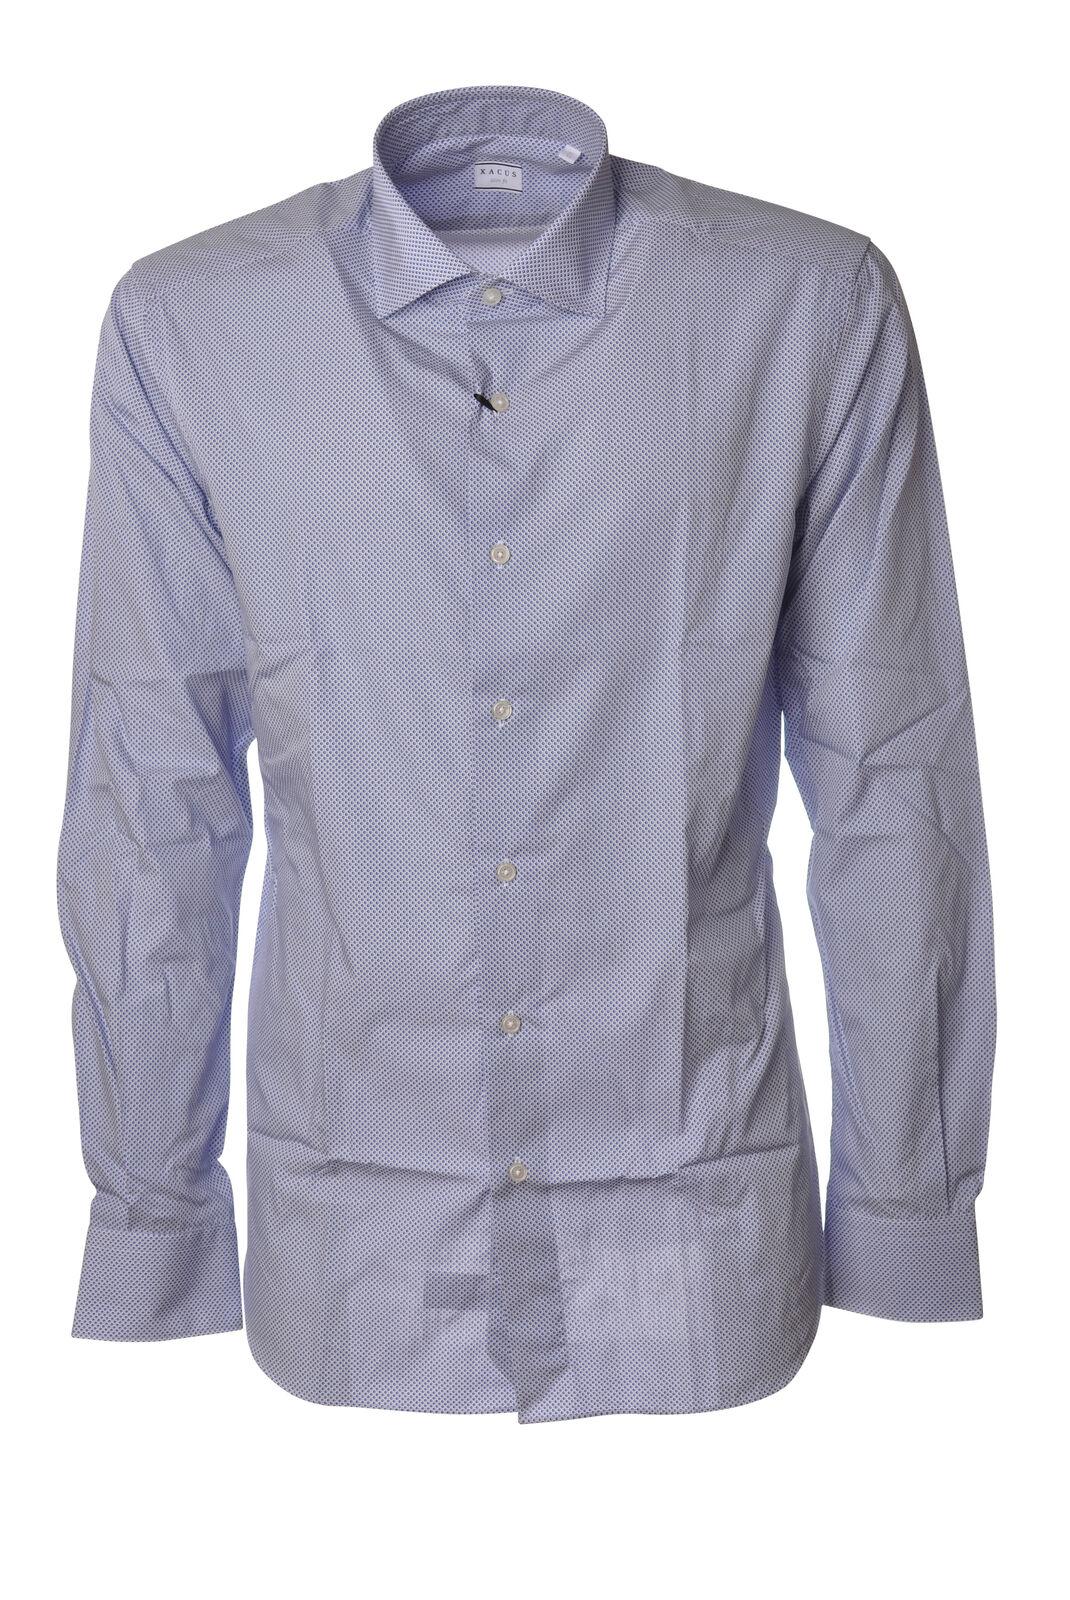 Xacus - Hemden-Hemden - Mann - Fantasie - 5321607C195007